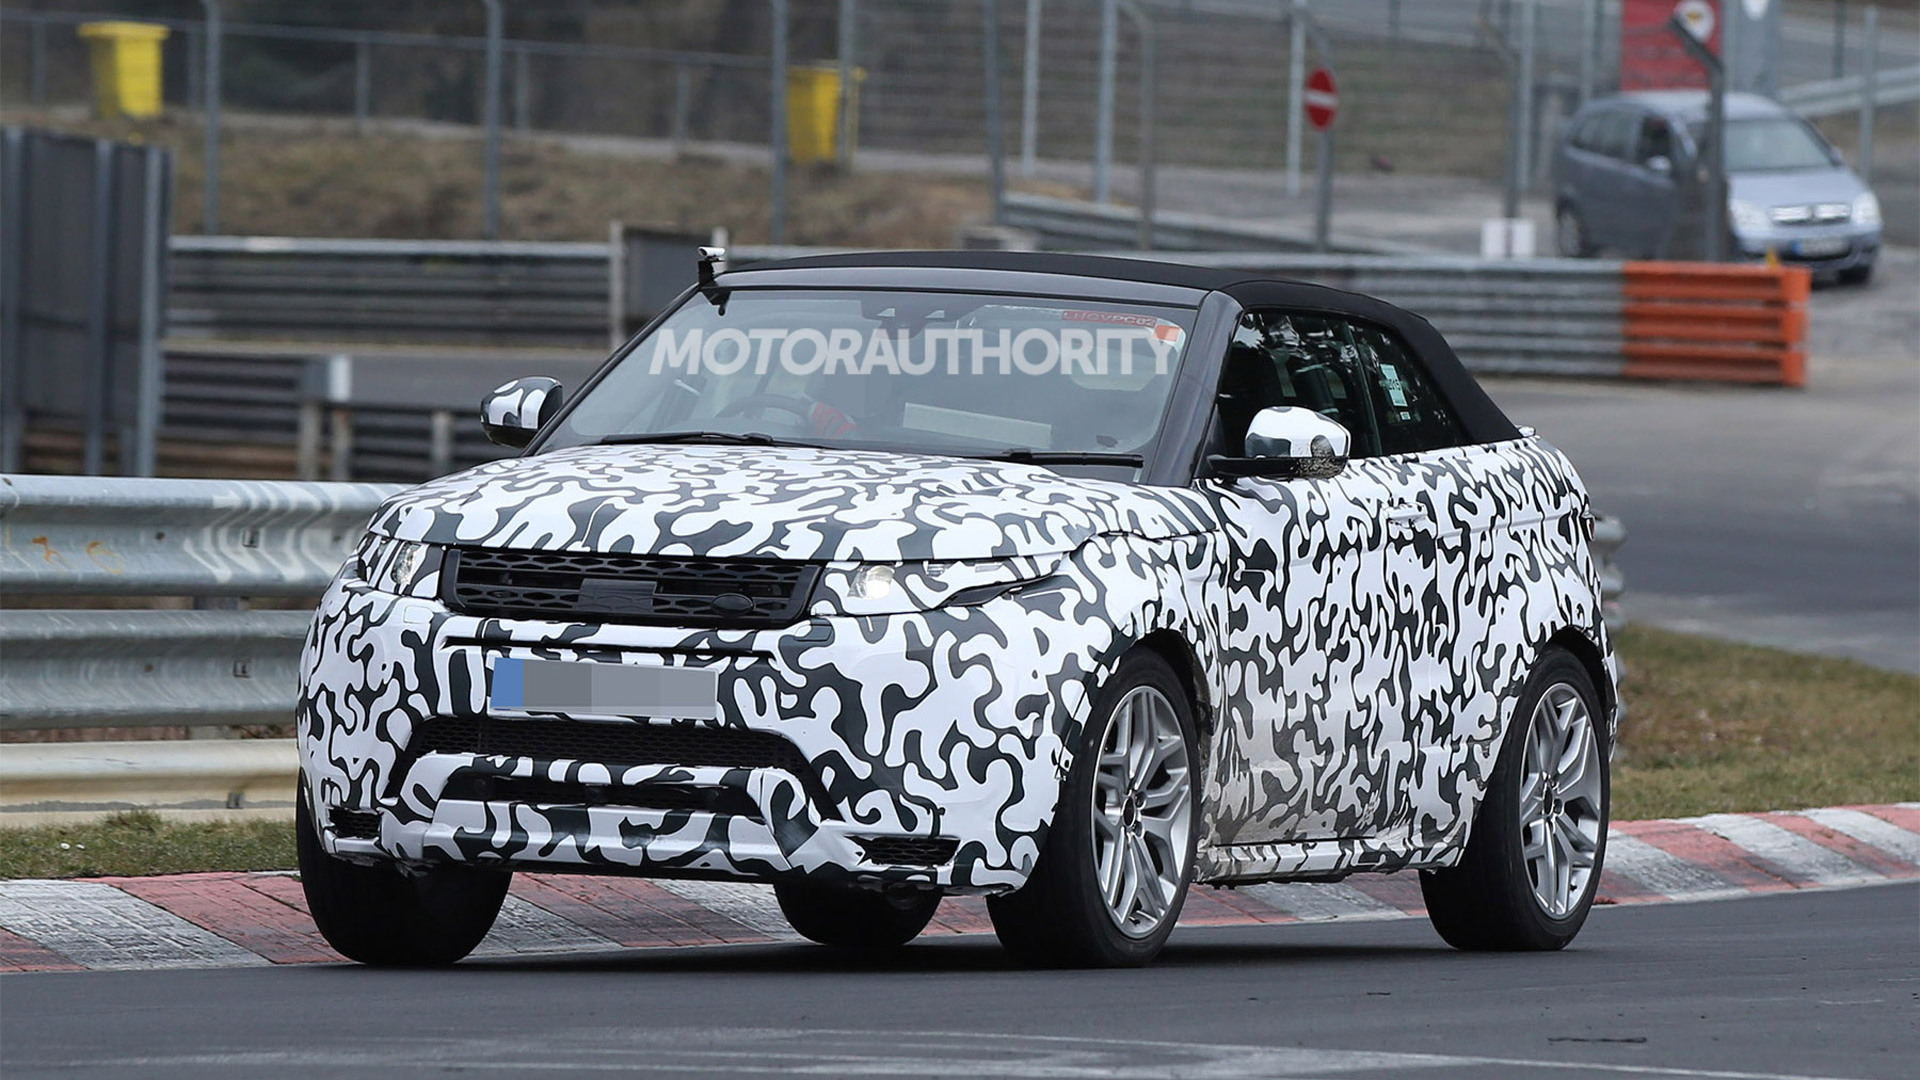 2016 Land Rover Range Rover Evoque Convertible spy shots - Image via S. Baldauf/SB-Medien